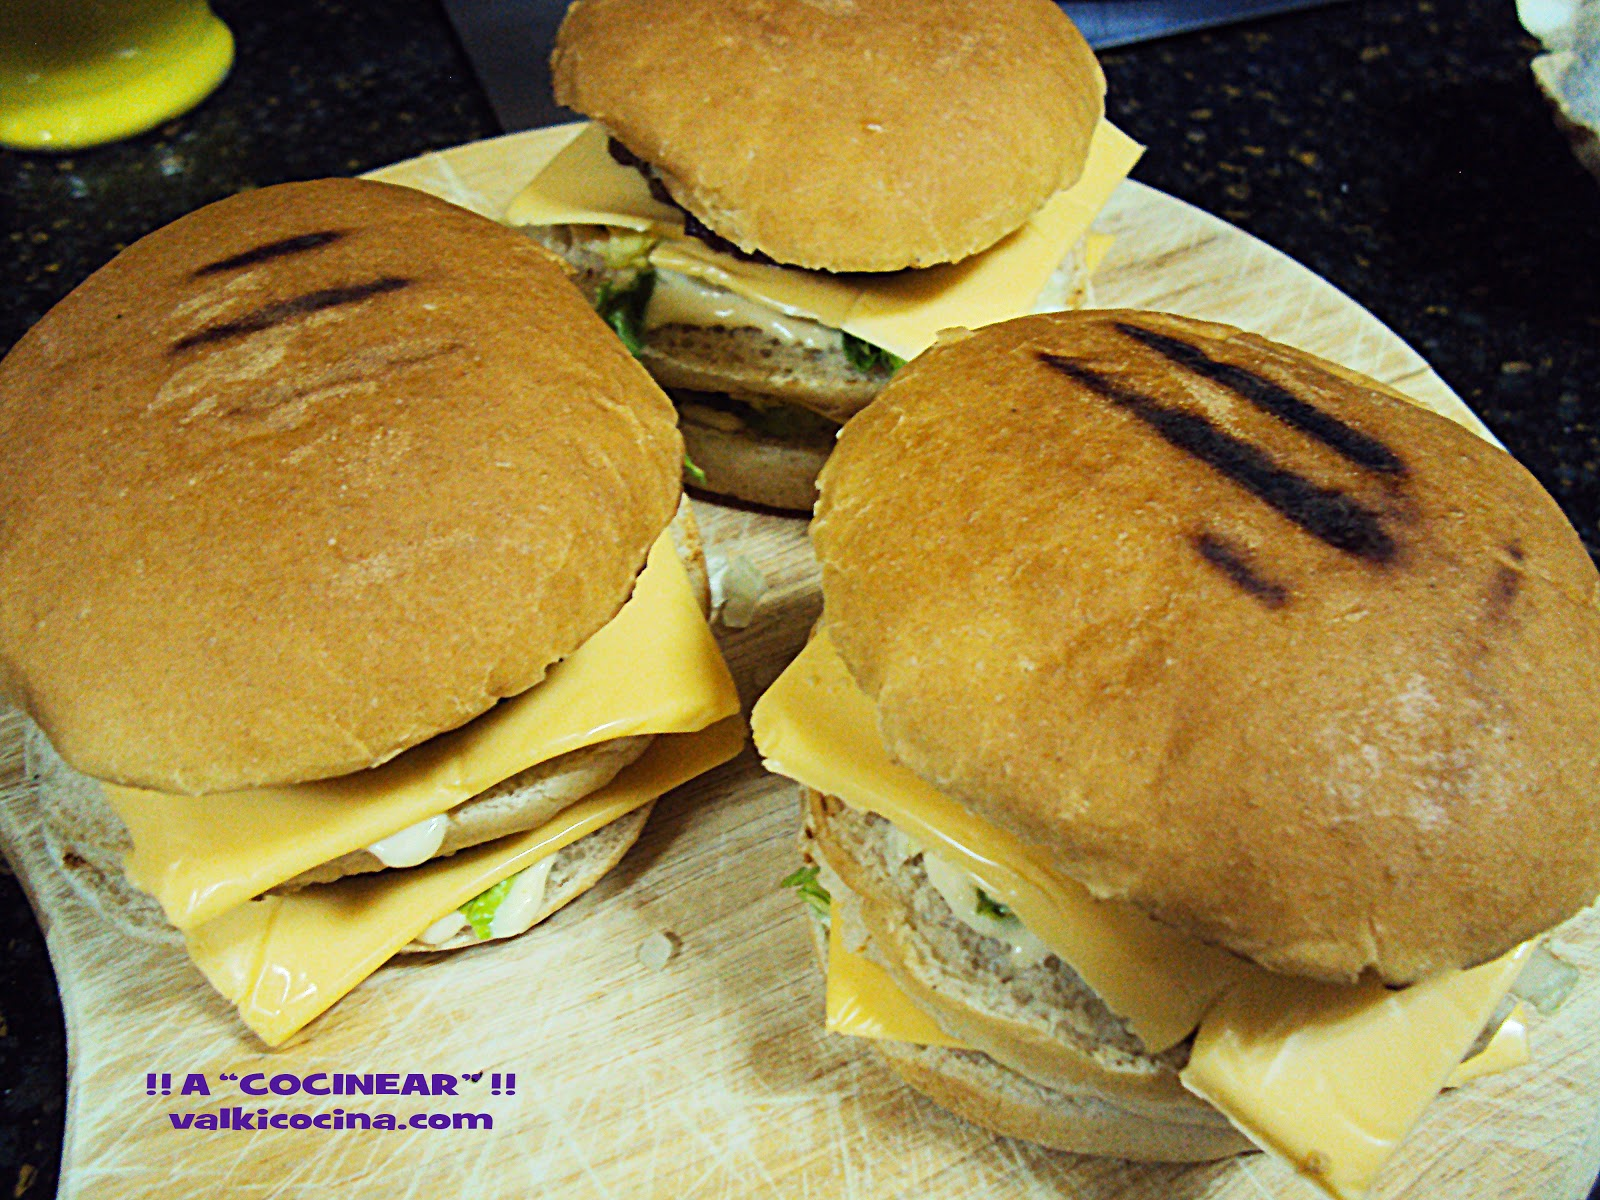 Hamburguesas y salsa Big Mac caseras